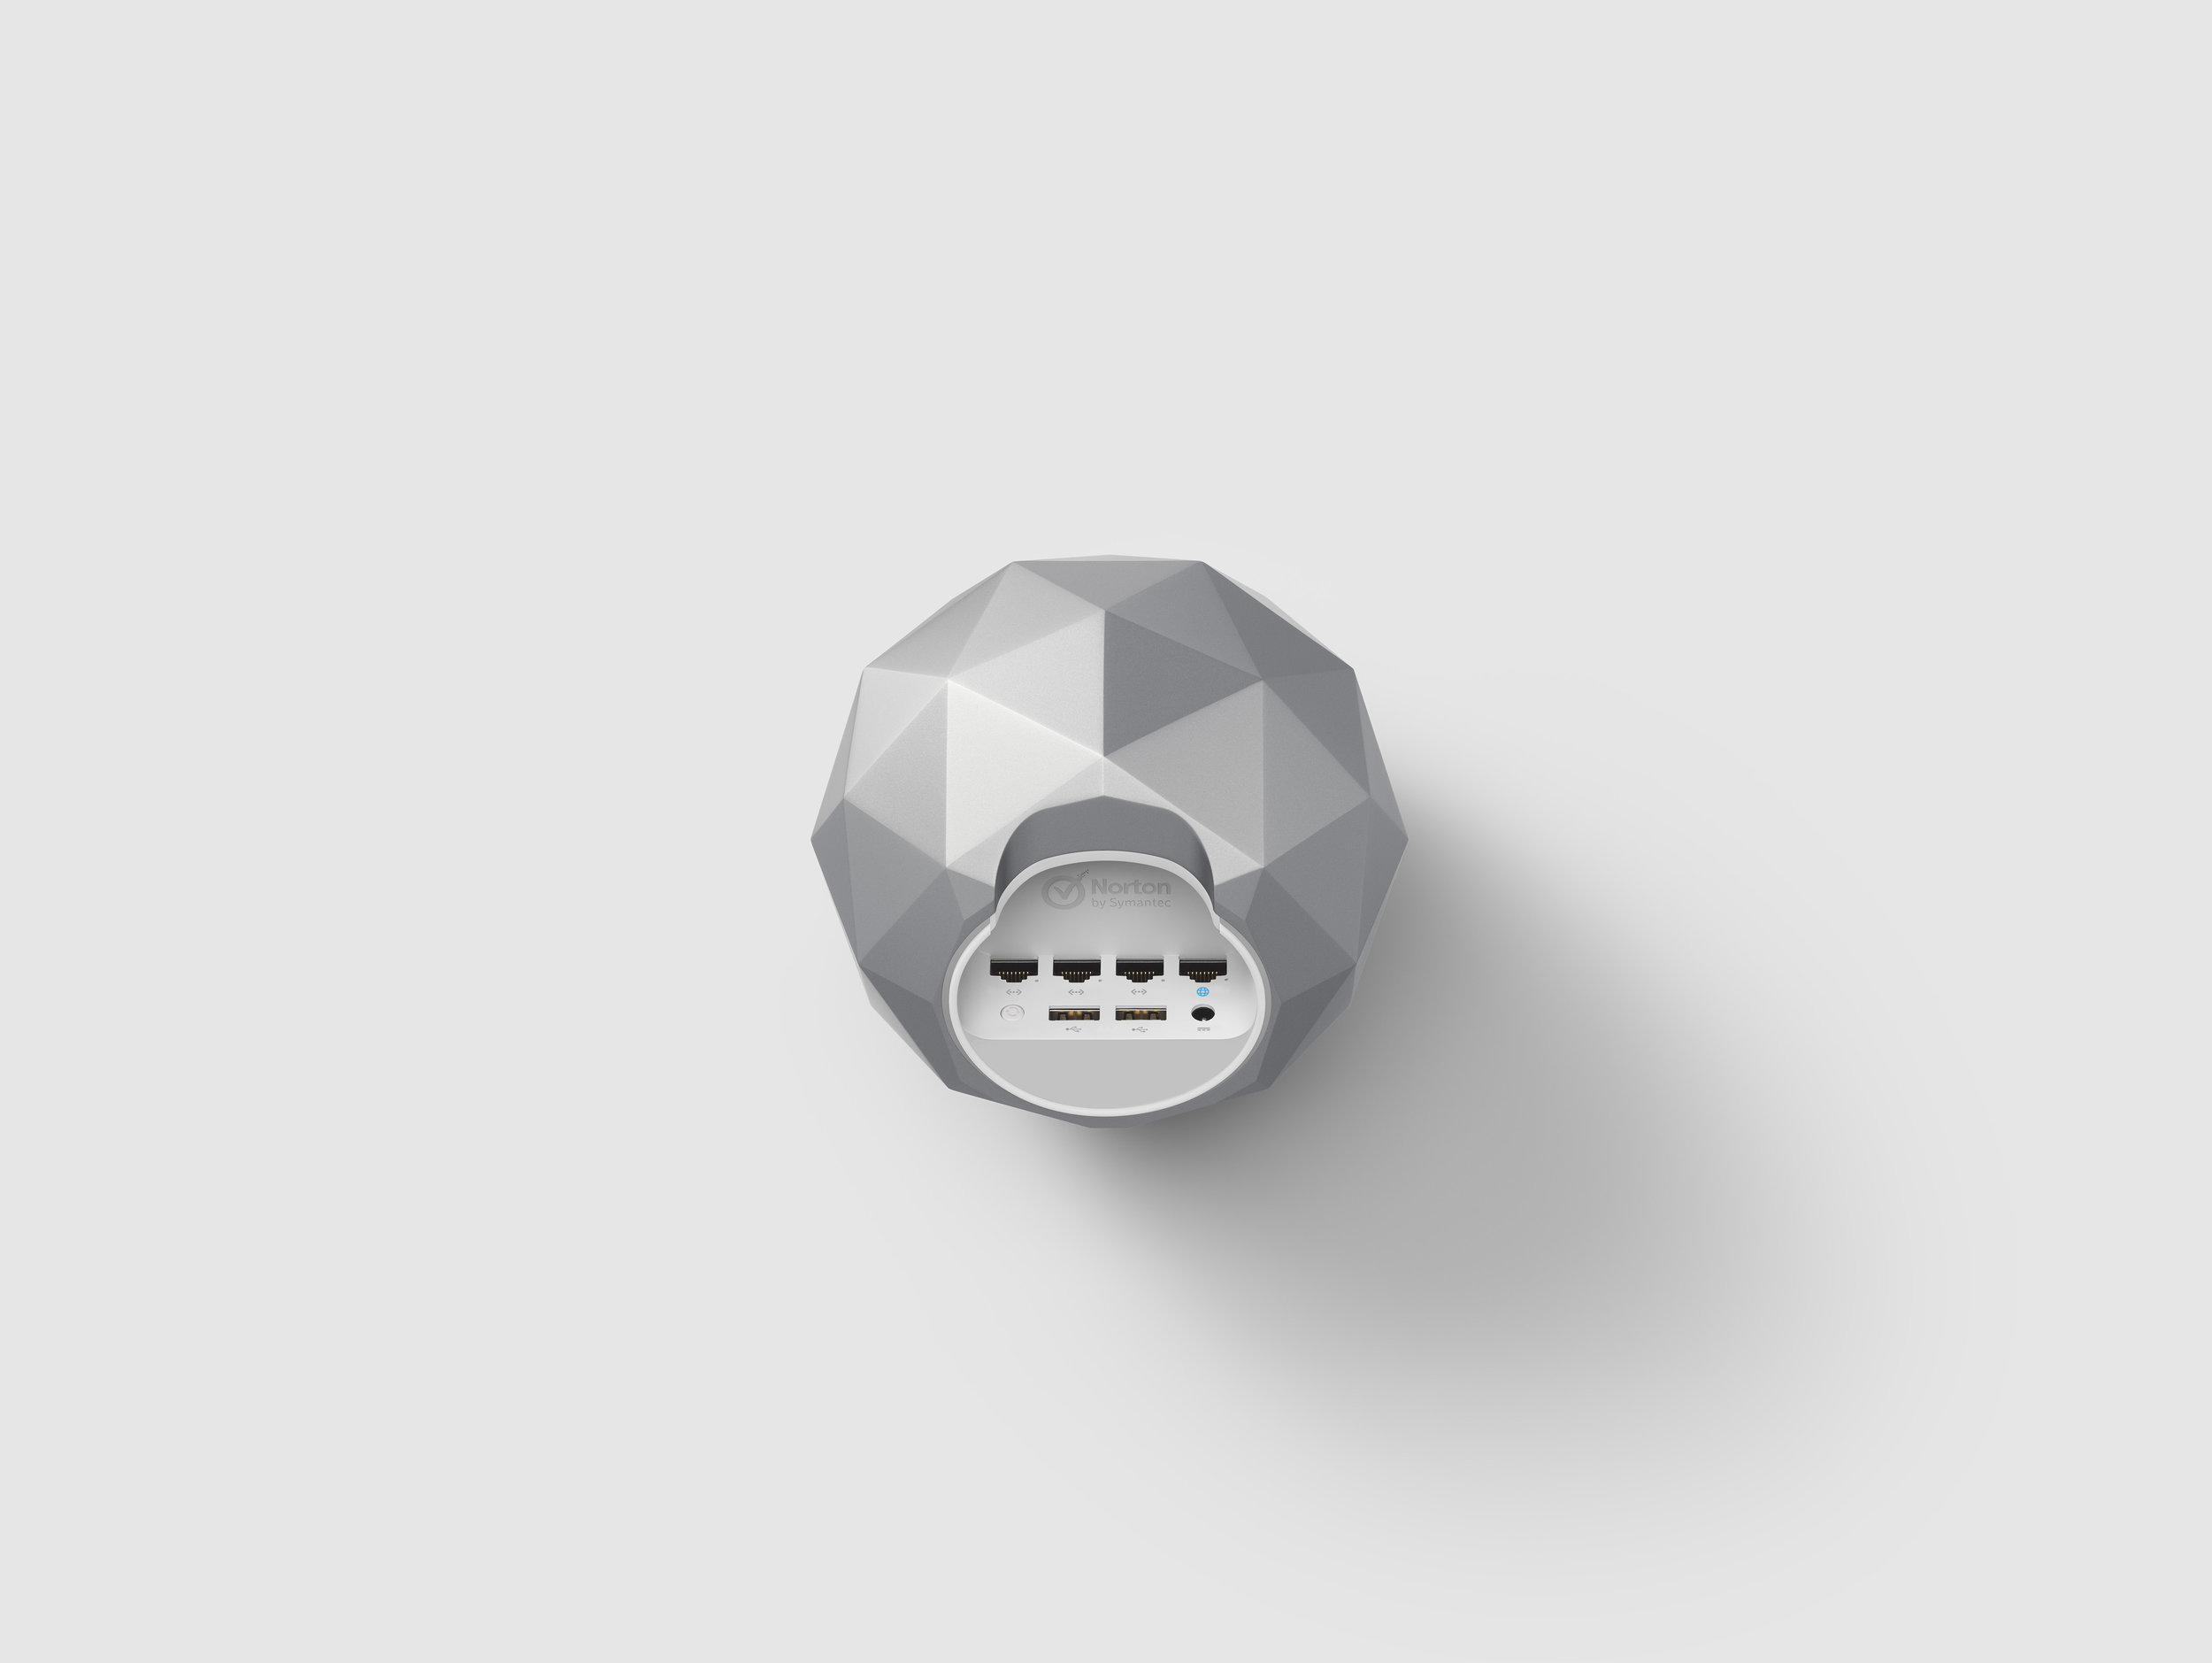 04_Rover_Bottom_03_R3-Grey GRAPHICS.jpg